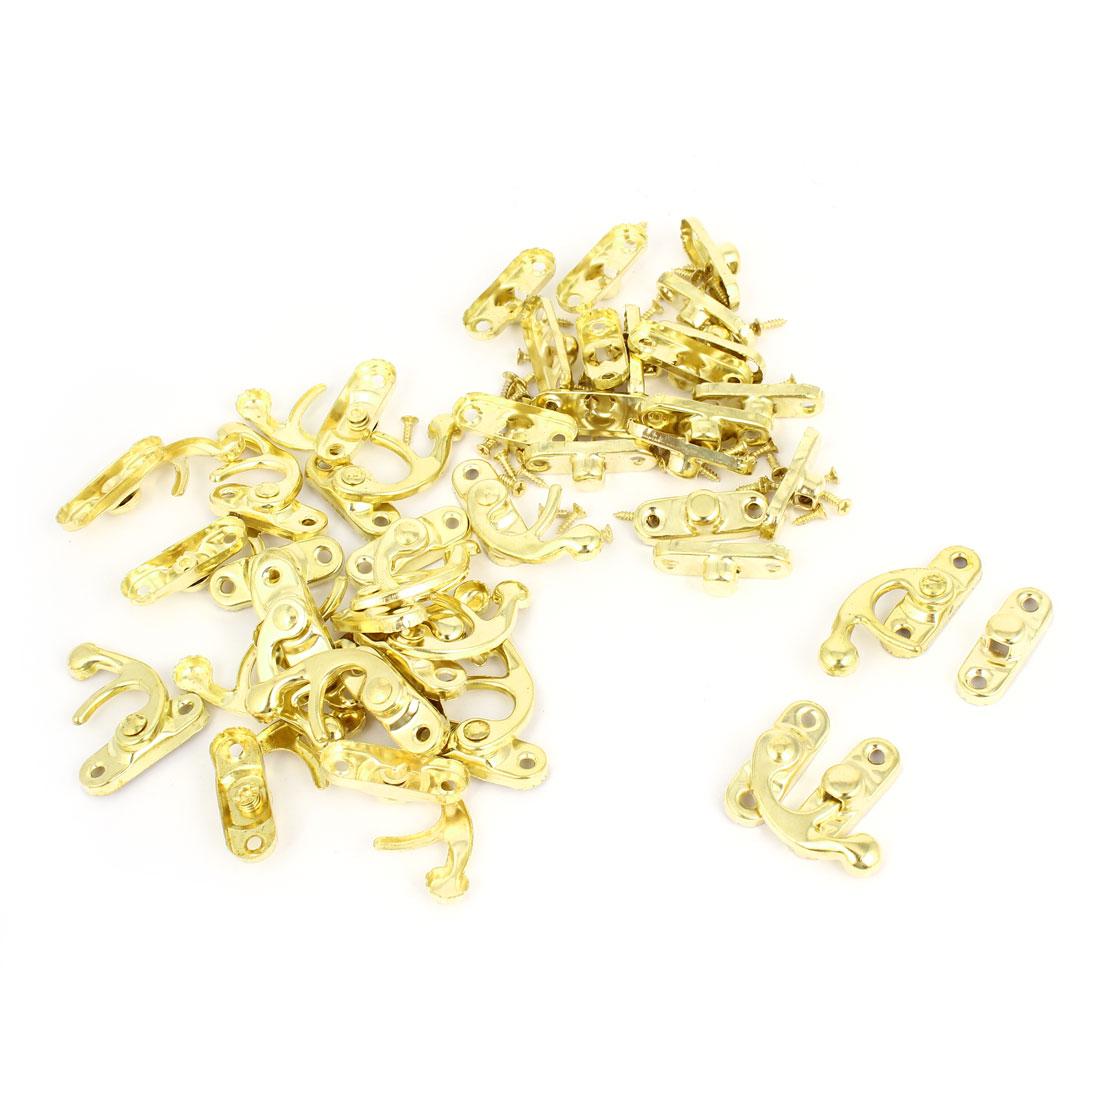 Right Latch Hook Antique Wood Box Catch Decorative Gold Tone 20 Pcs w Screws<br><br>Aliexpress